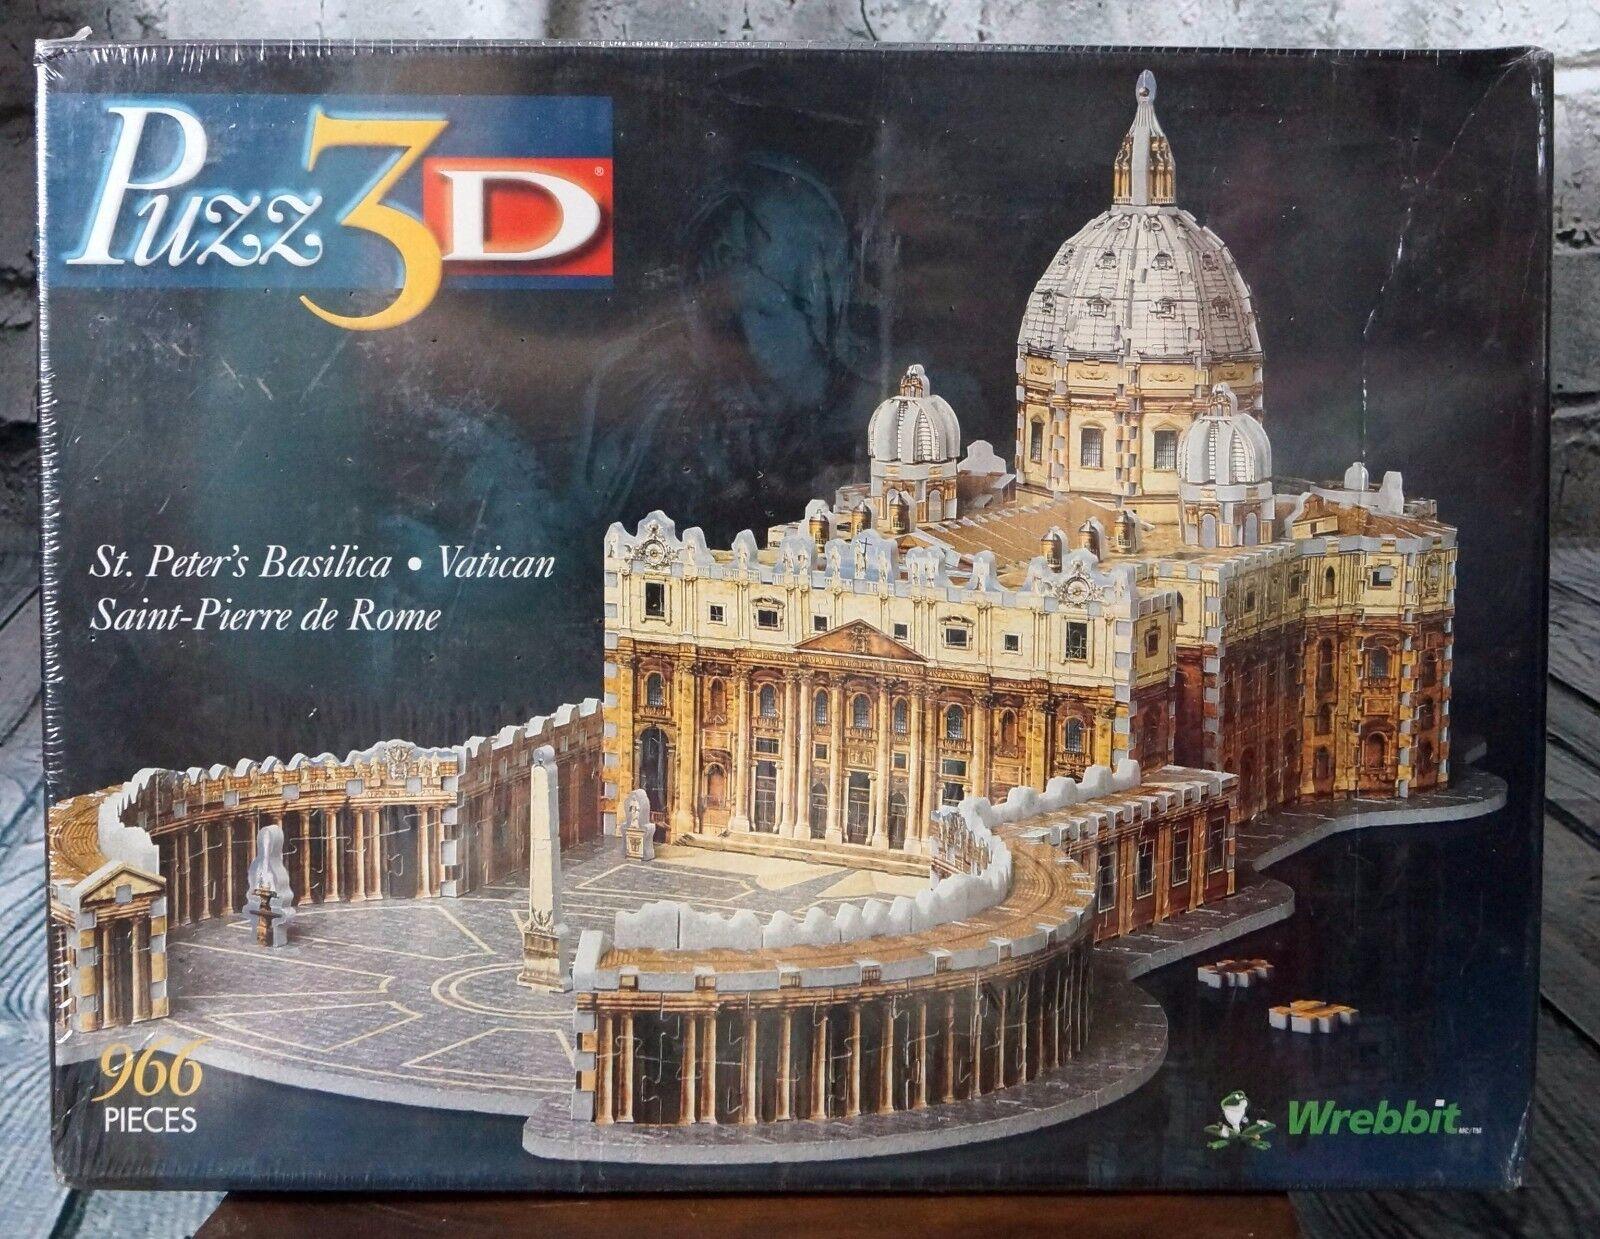 S t Peter s Basilica - Vatikanen, Rom, 966, 3D -pussel skapad av Wrebit